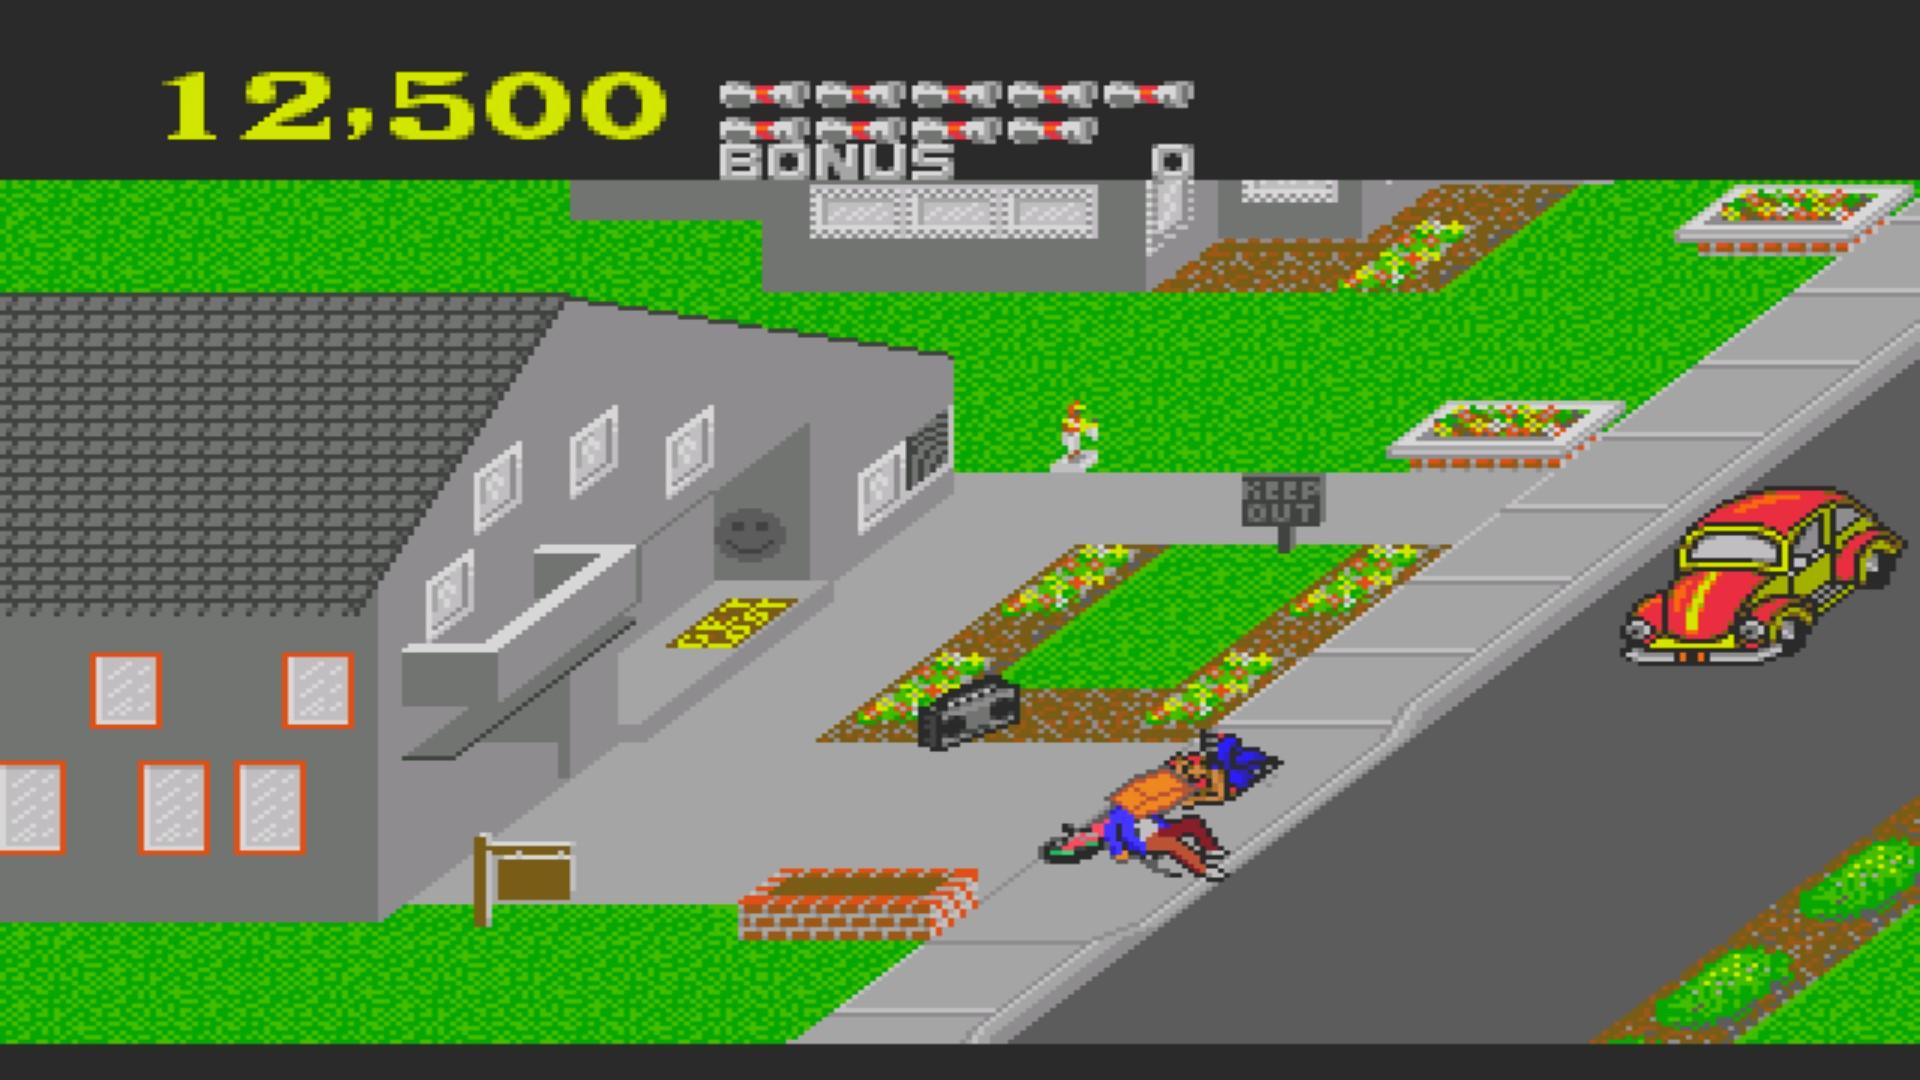 AkinNahtanoj: Paperboy [Middle Road] (Sega Genesis / MegaDrive Emulated) 12,500 points on 2020-08-26 16:55:12